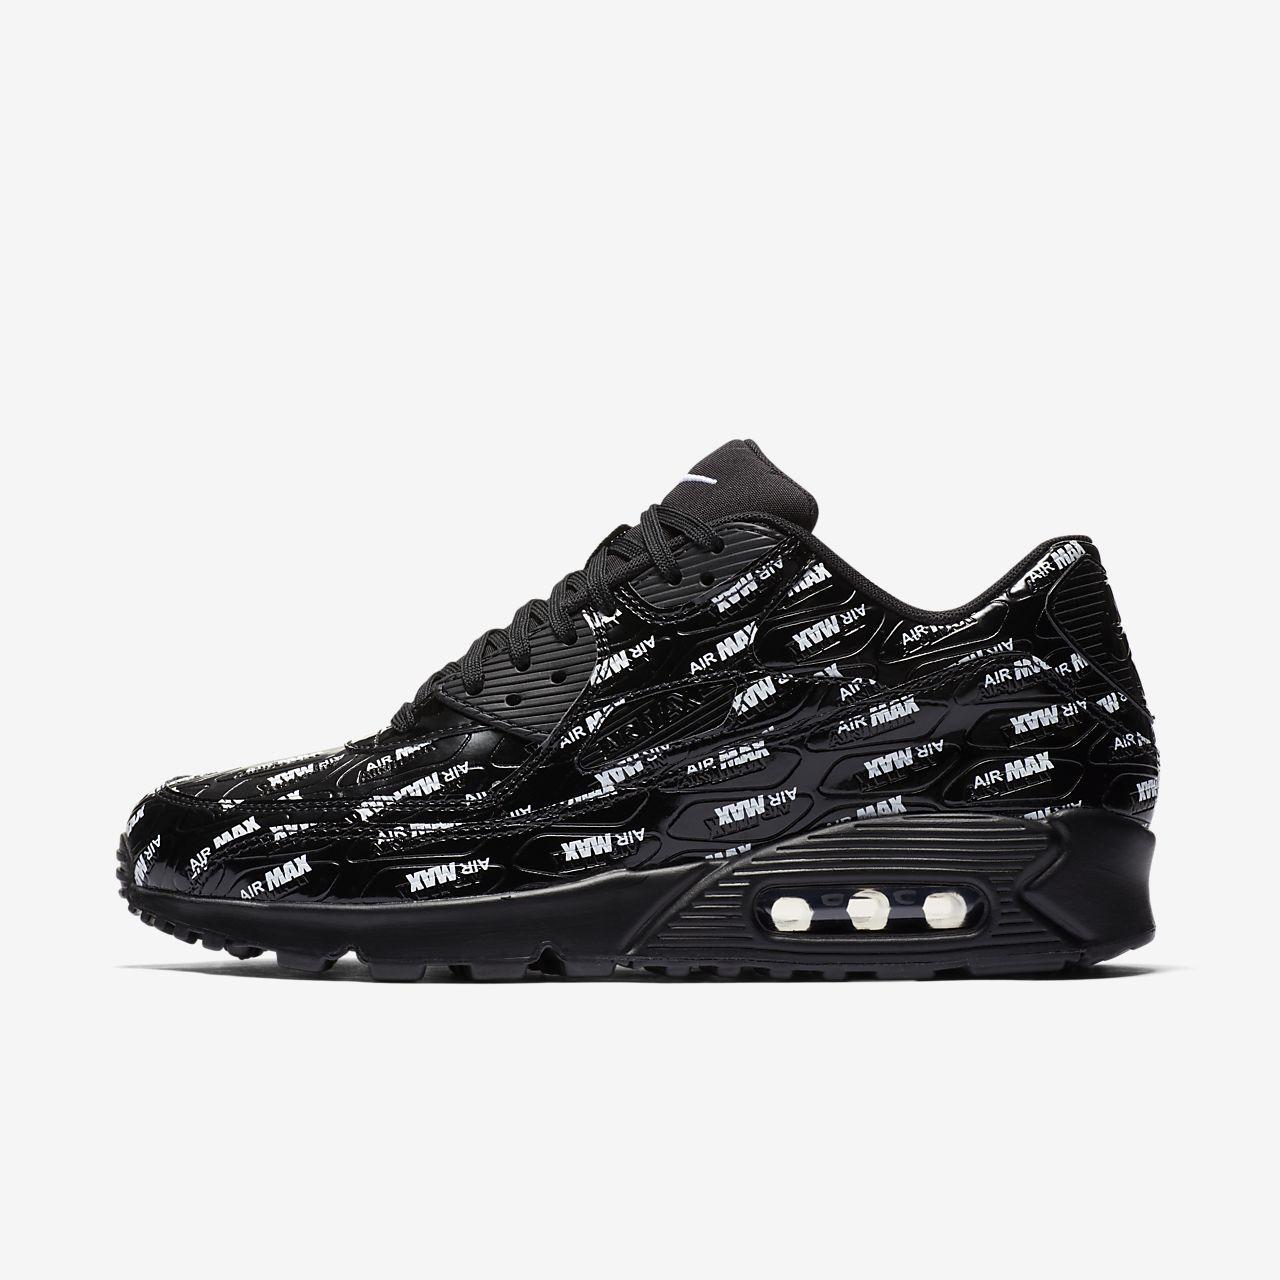 online retailer 91abe c345b ... Nike Air Max 90 Premium Herrenschuh